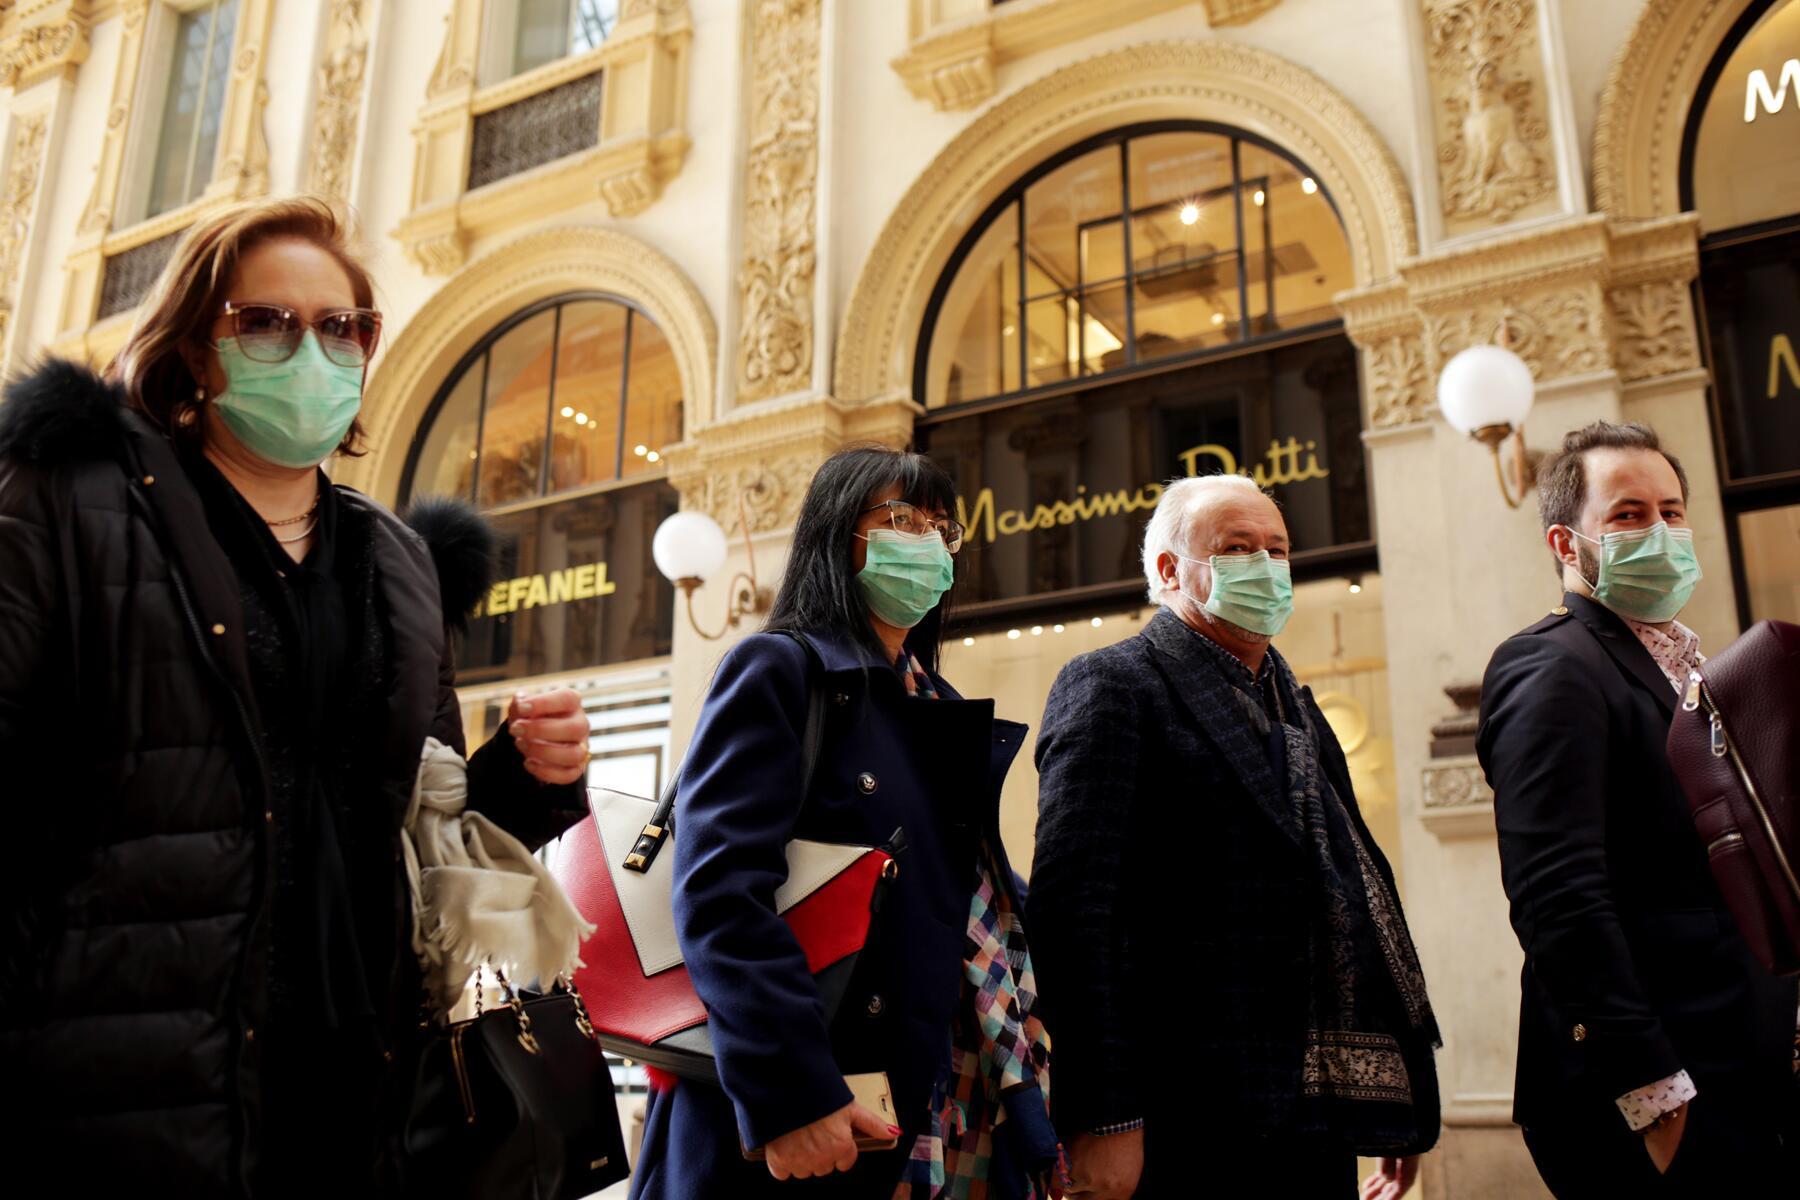 Coronavirus Outbreak: Should You Cancel a Trip to Europe?